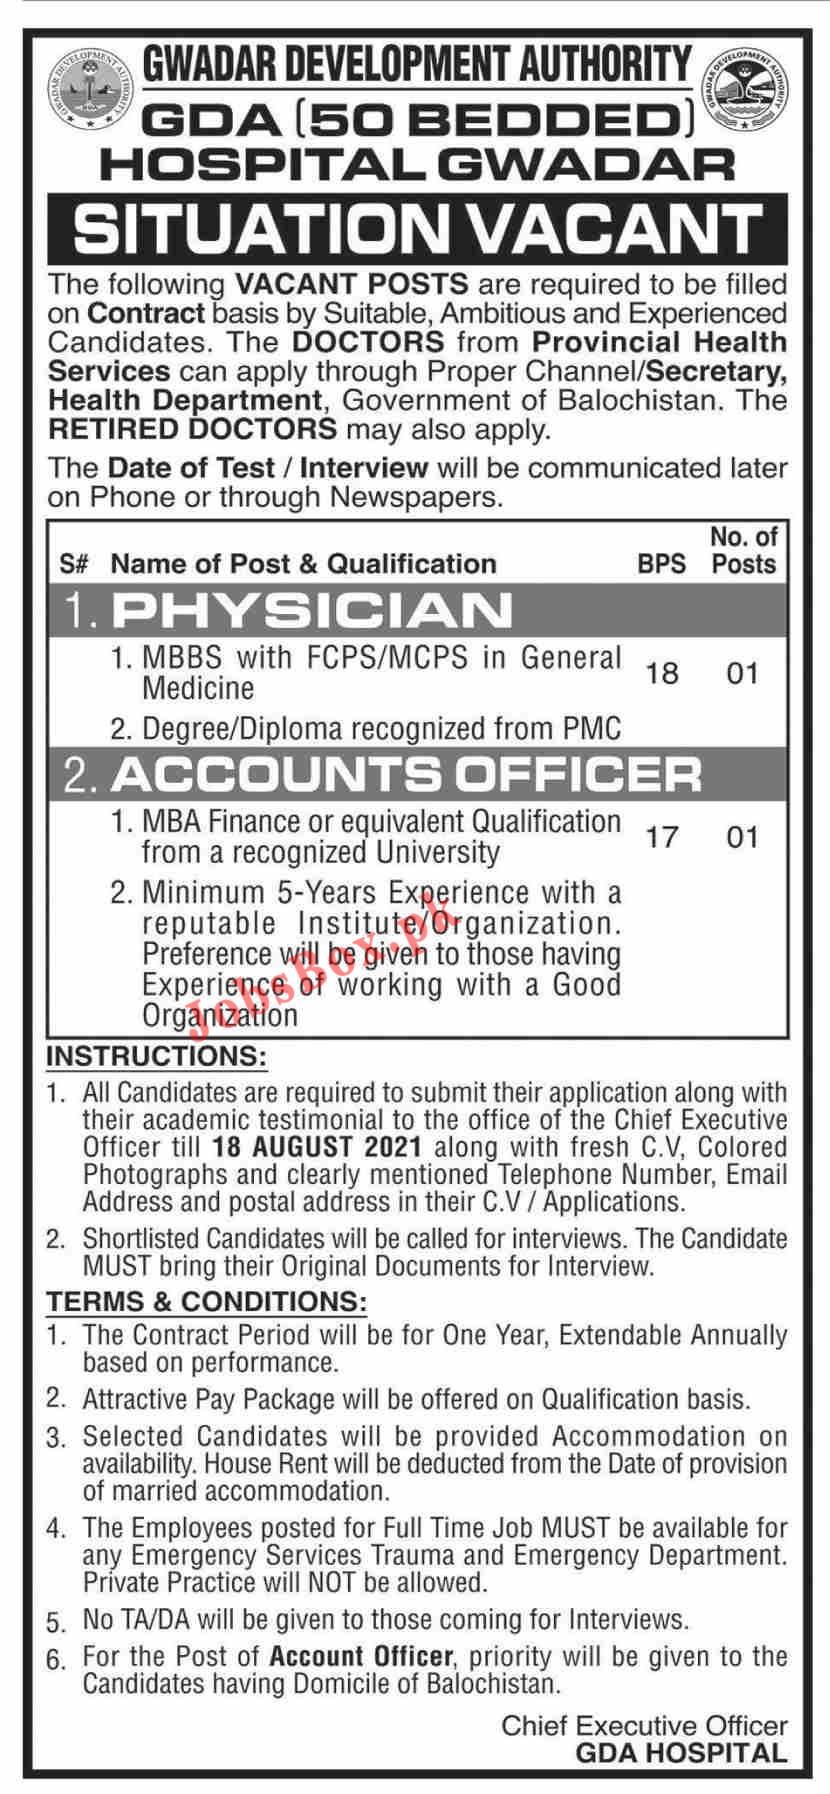 GDA Gwadar Development Authority Jobs 2021 in Pakistan